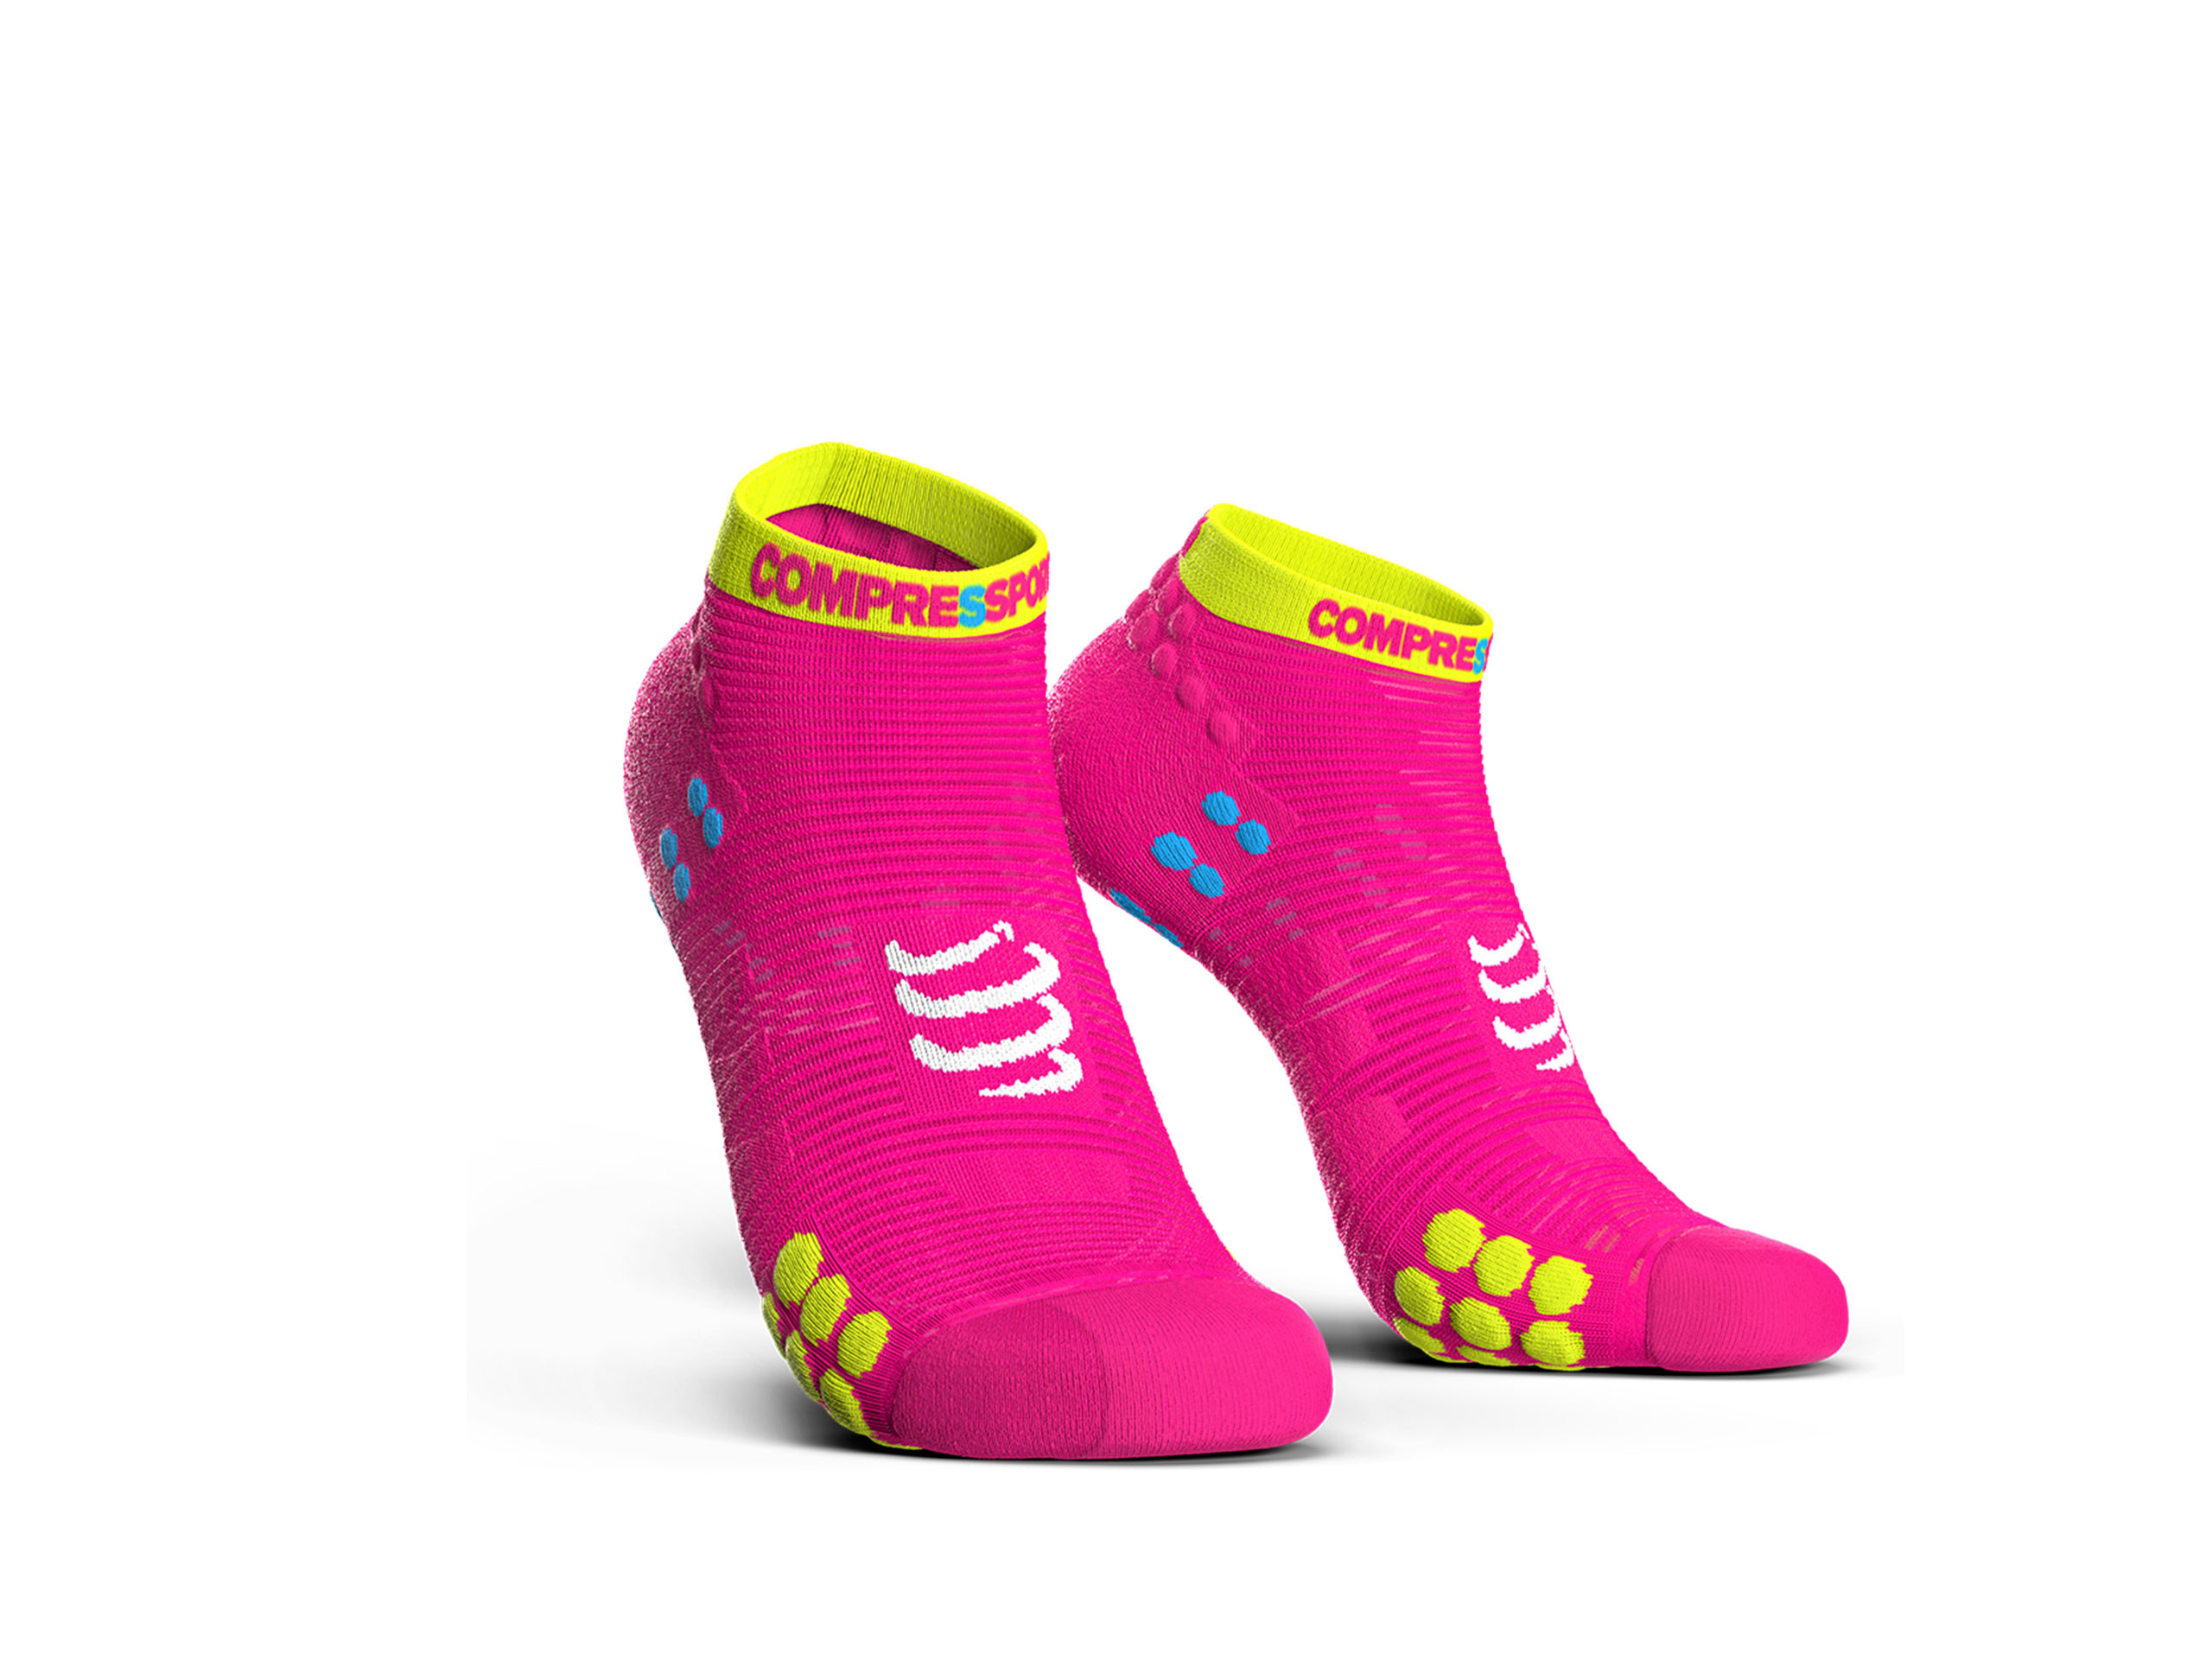 Pro Racing Socks v3.0 Run Low neongelb